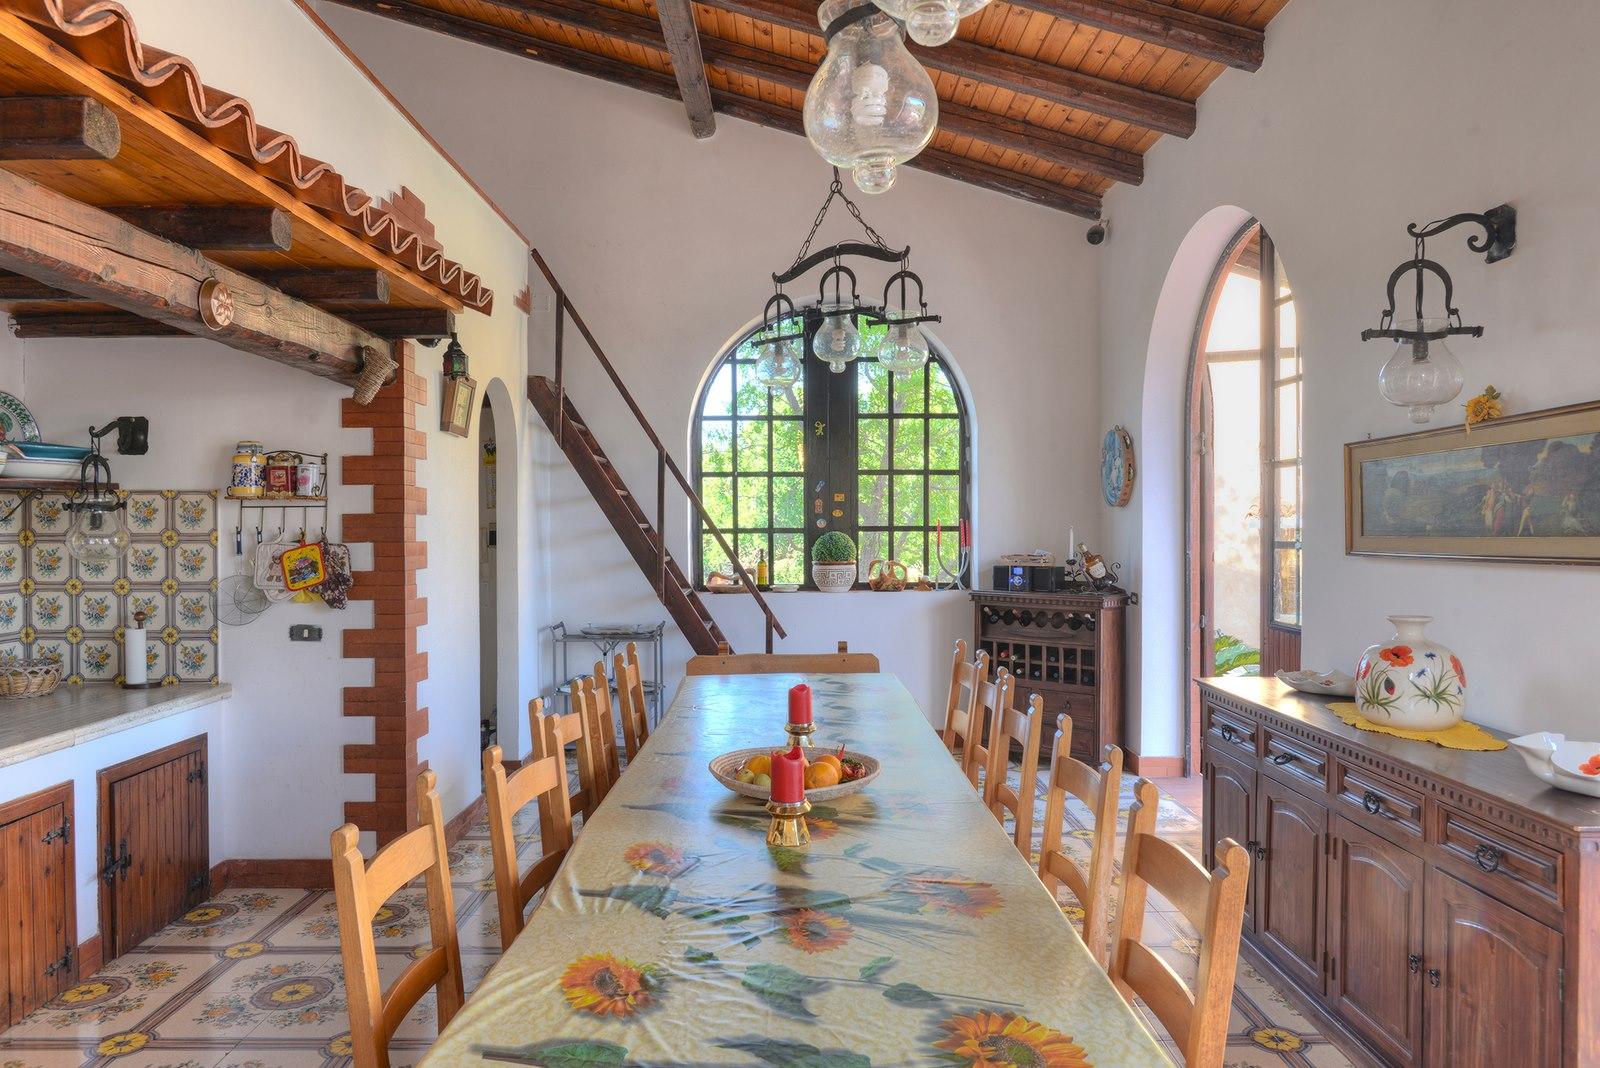 Maison de vacances Villa Casa (1531407), Solarino, Siracusa, Sicile, Italie, image 4